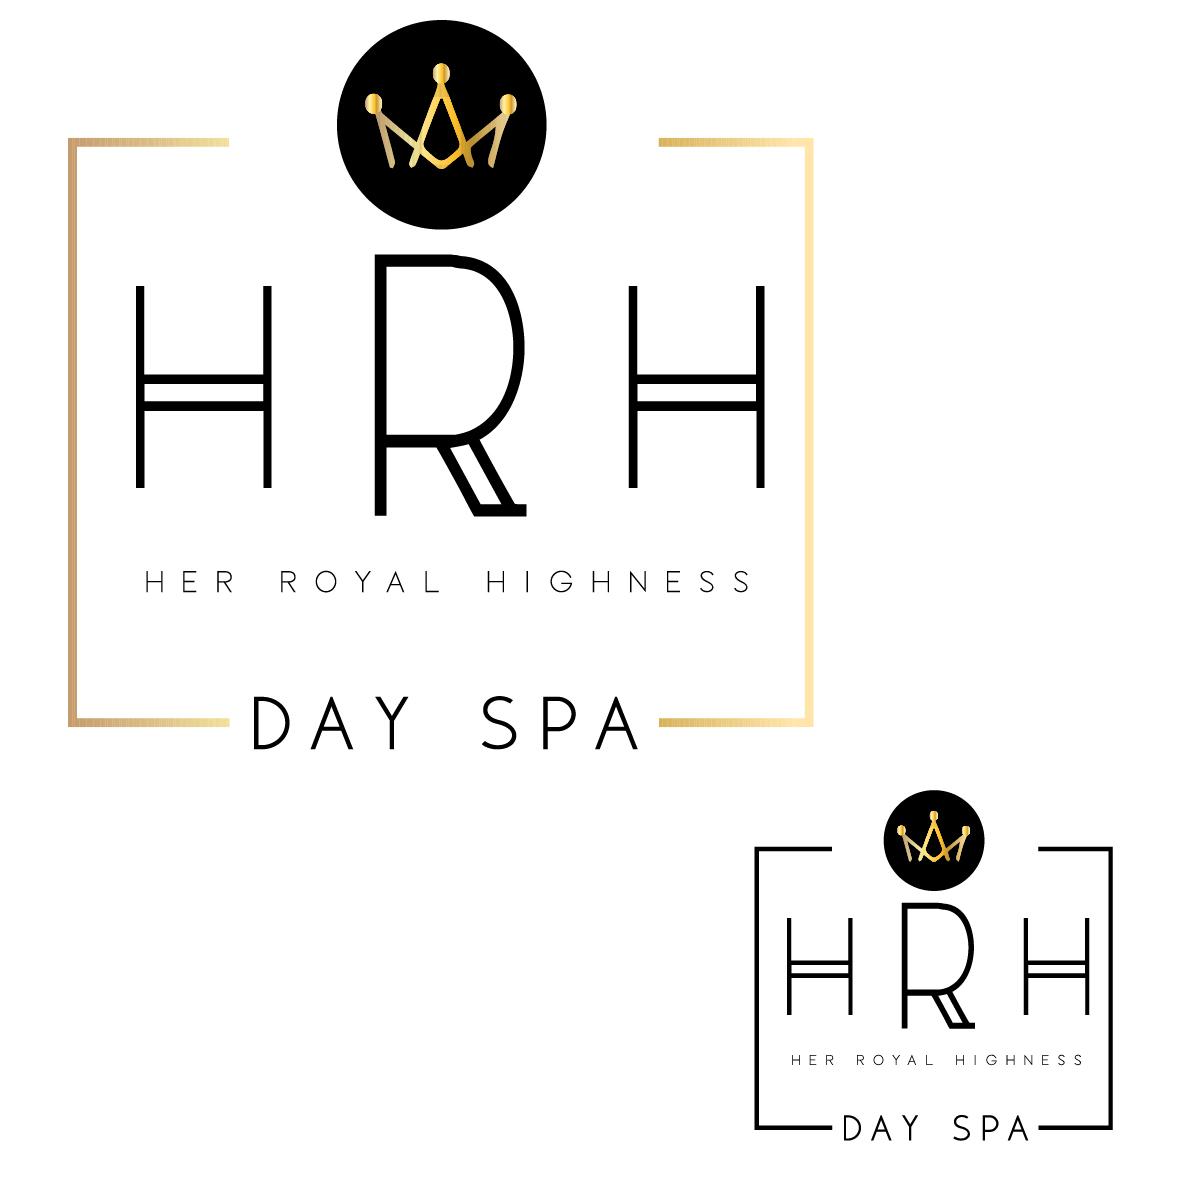 Her Royal Highness Logo